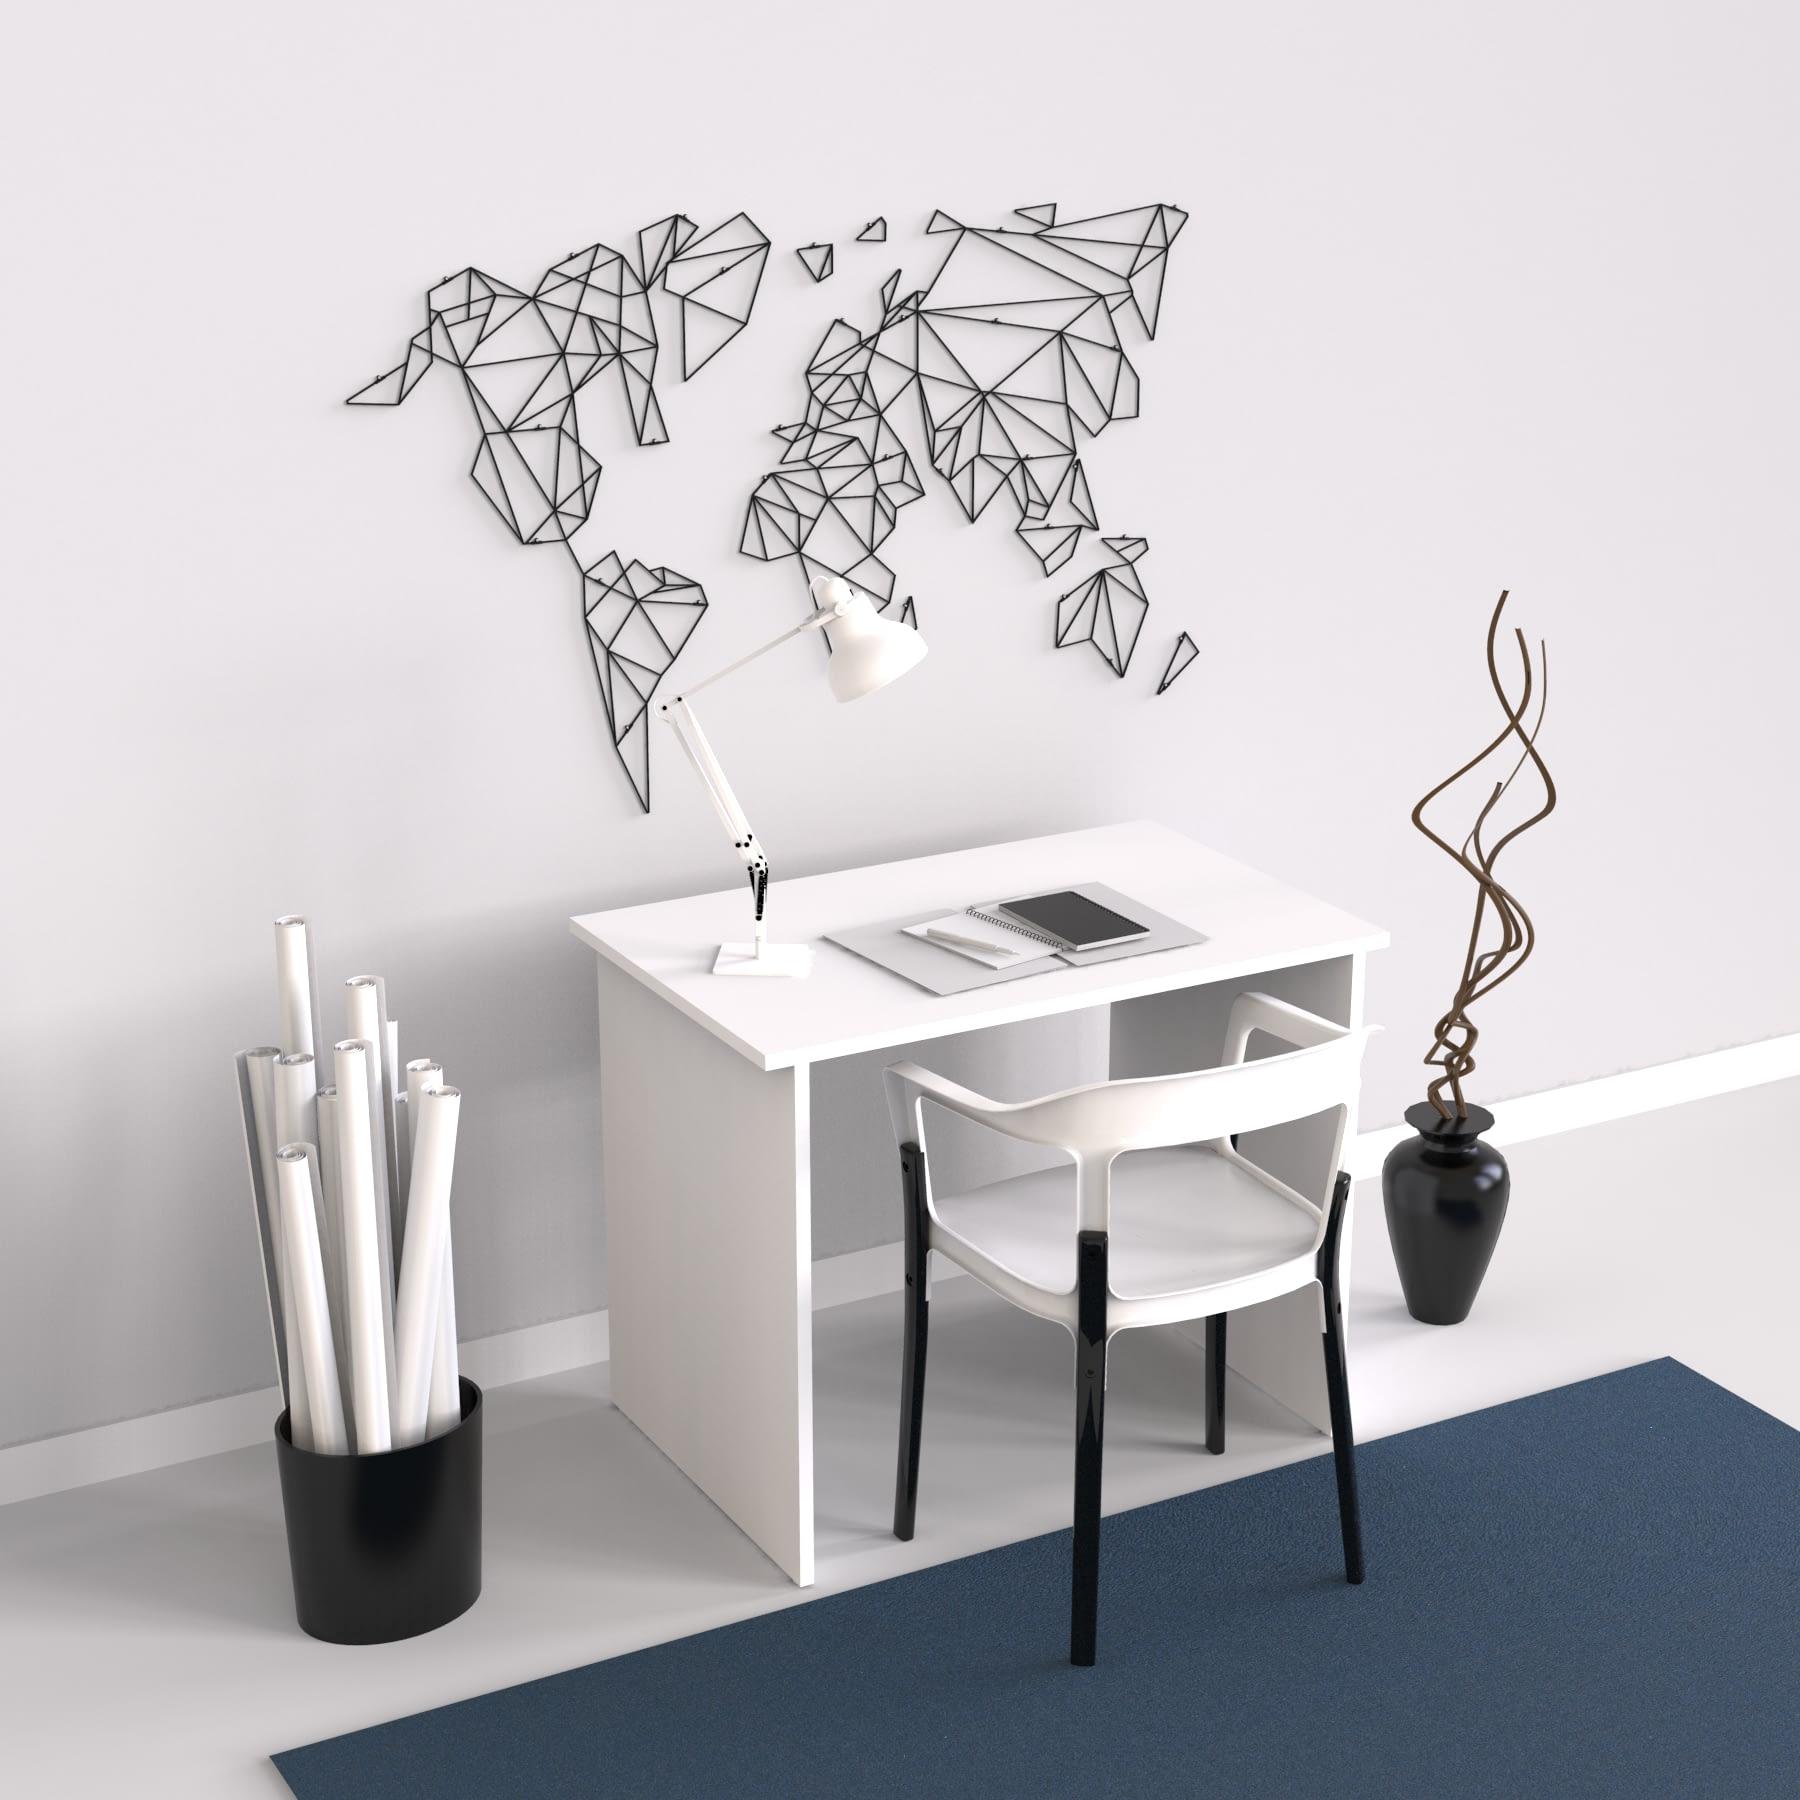 Mimilos M1 Study Desk